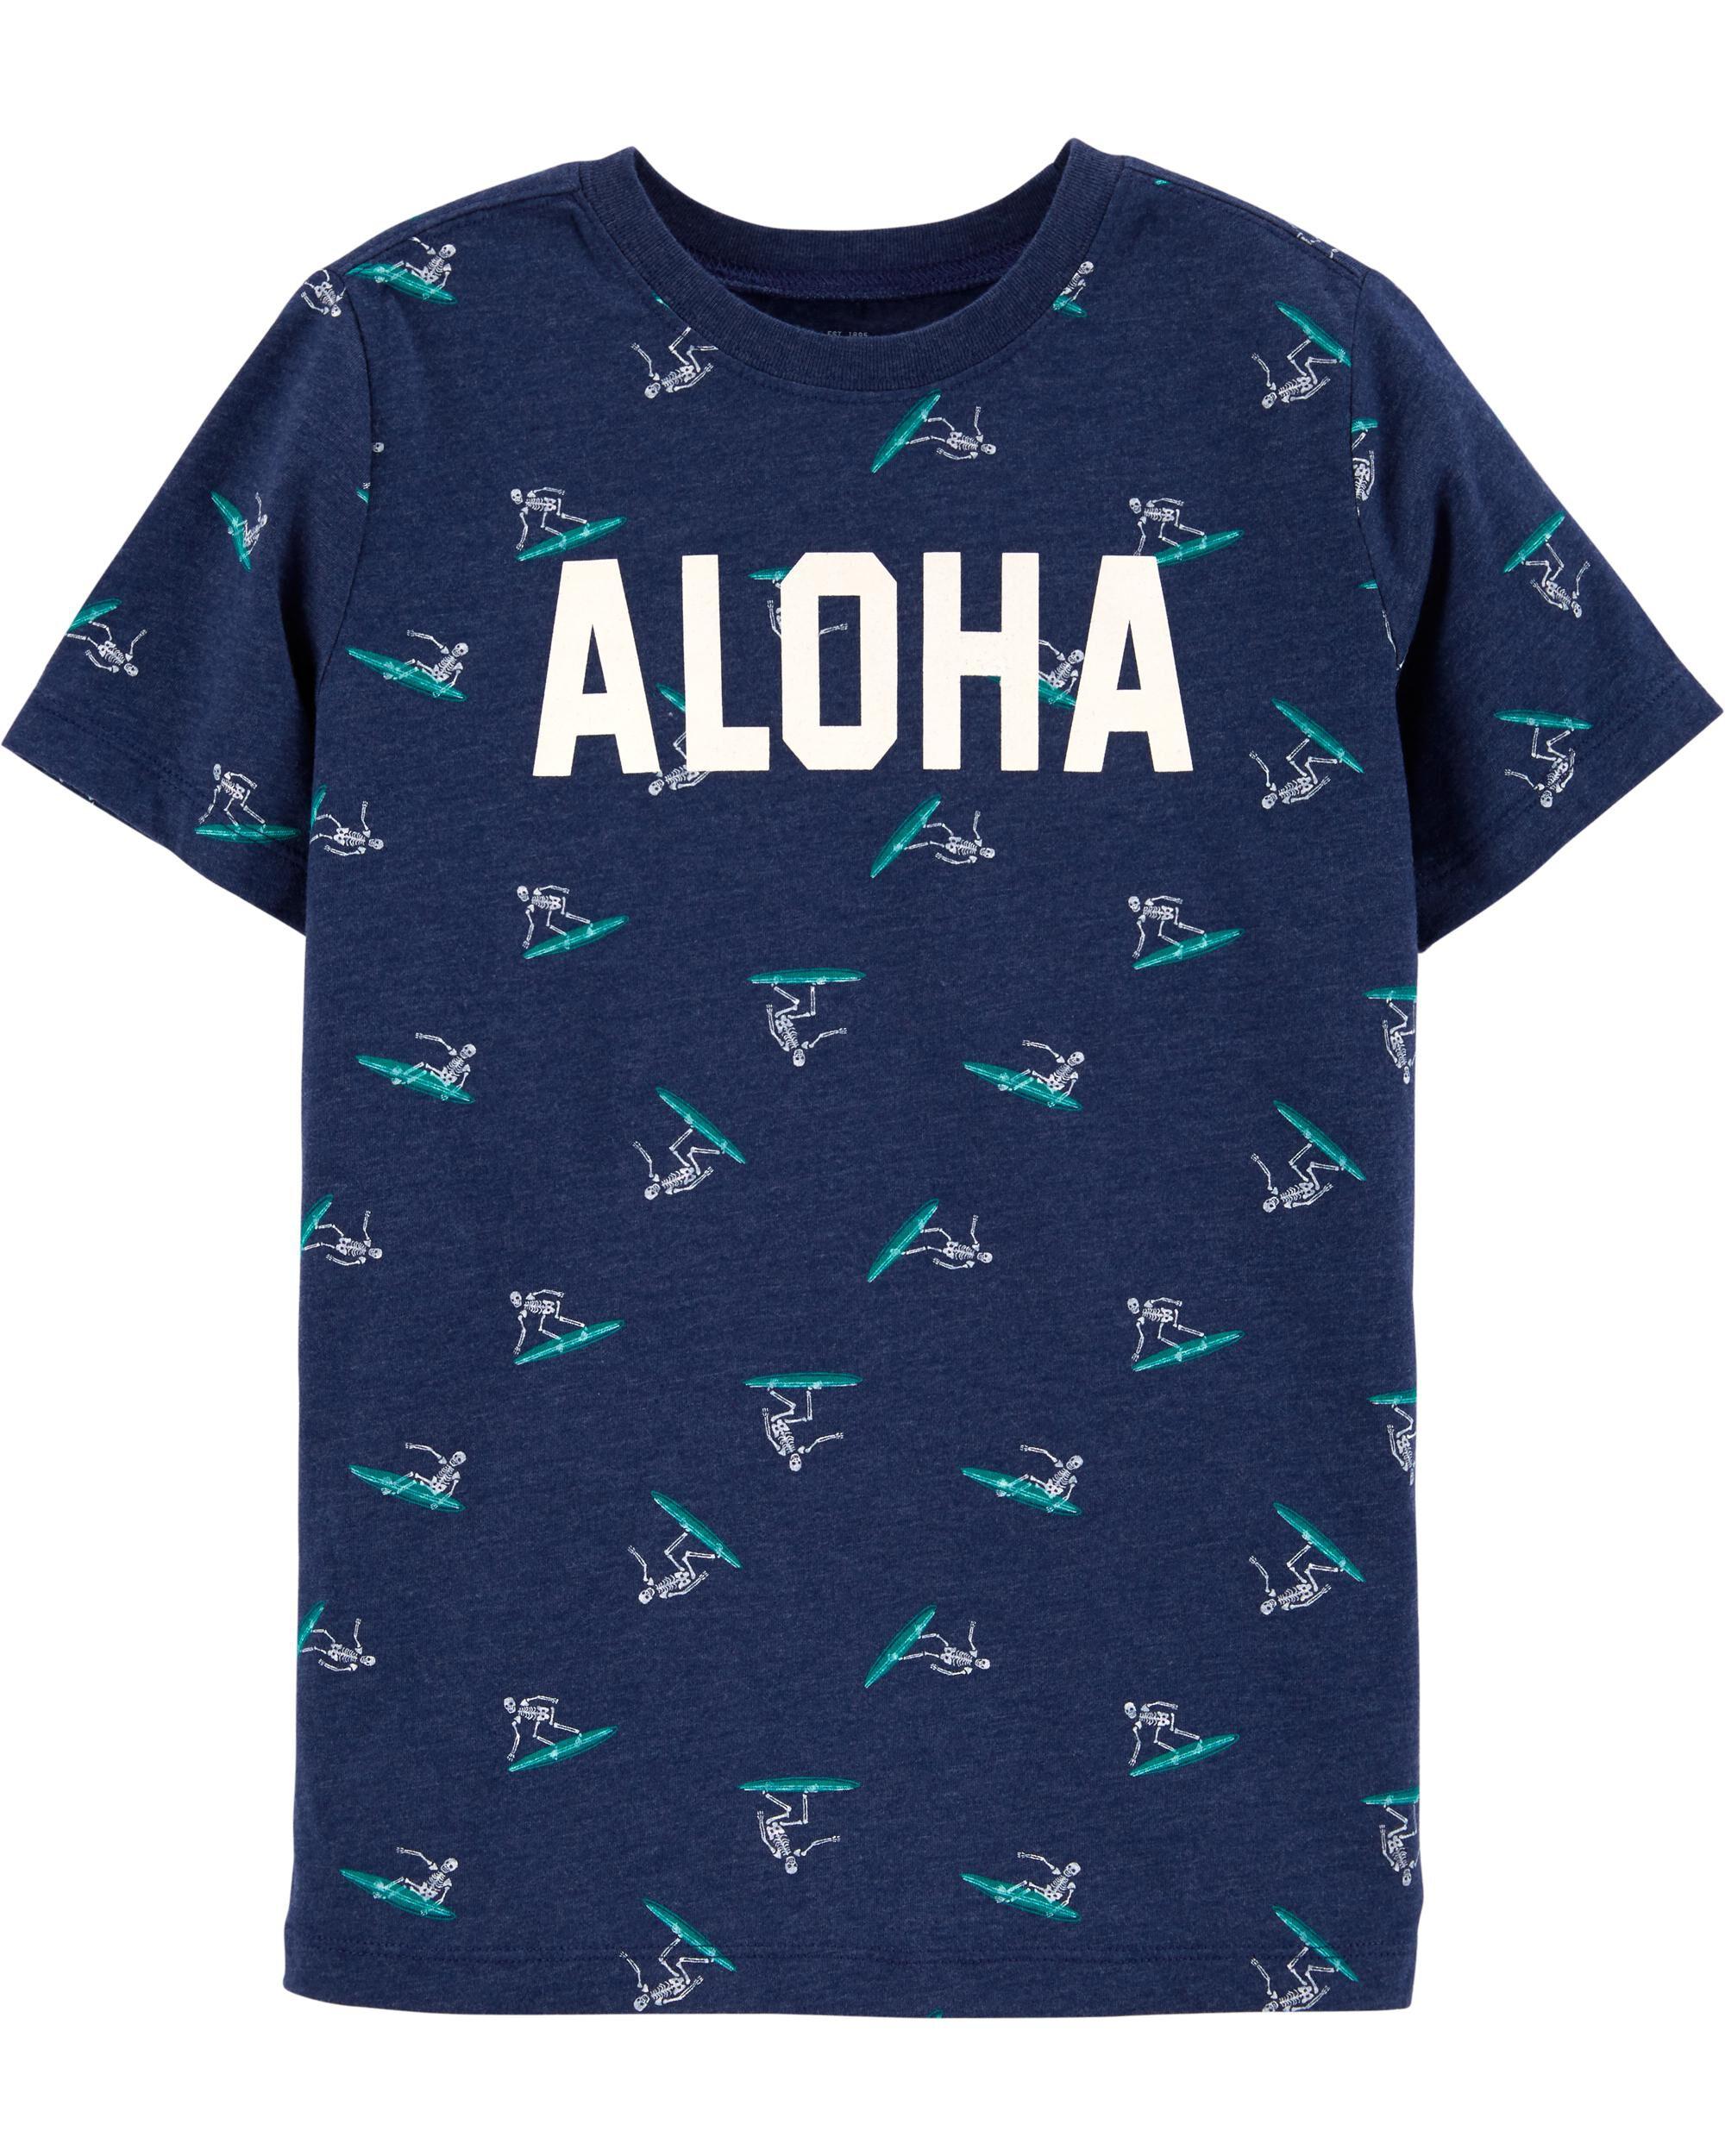 *CLEARANCE* Glow-in-the-Dark Aloha Tee